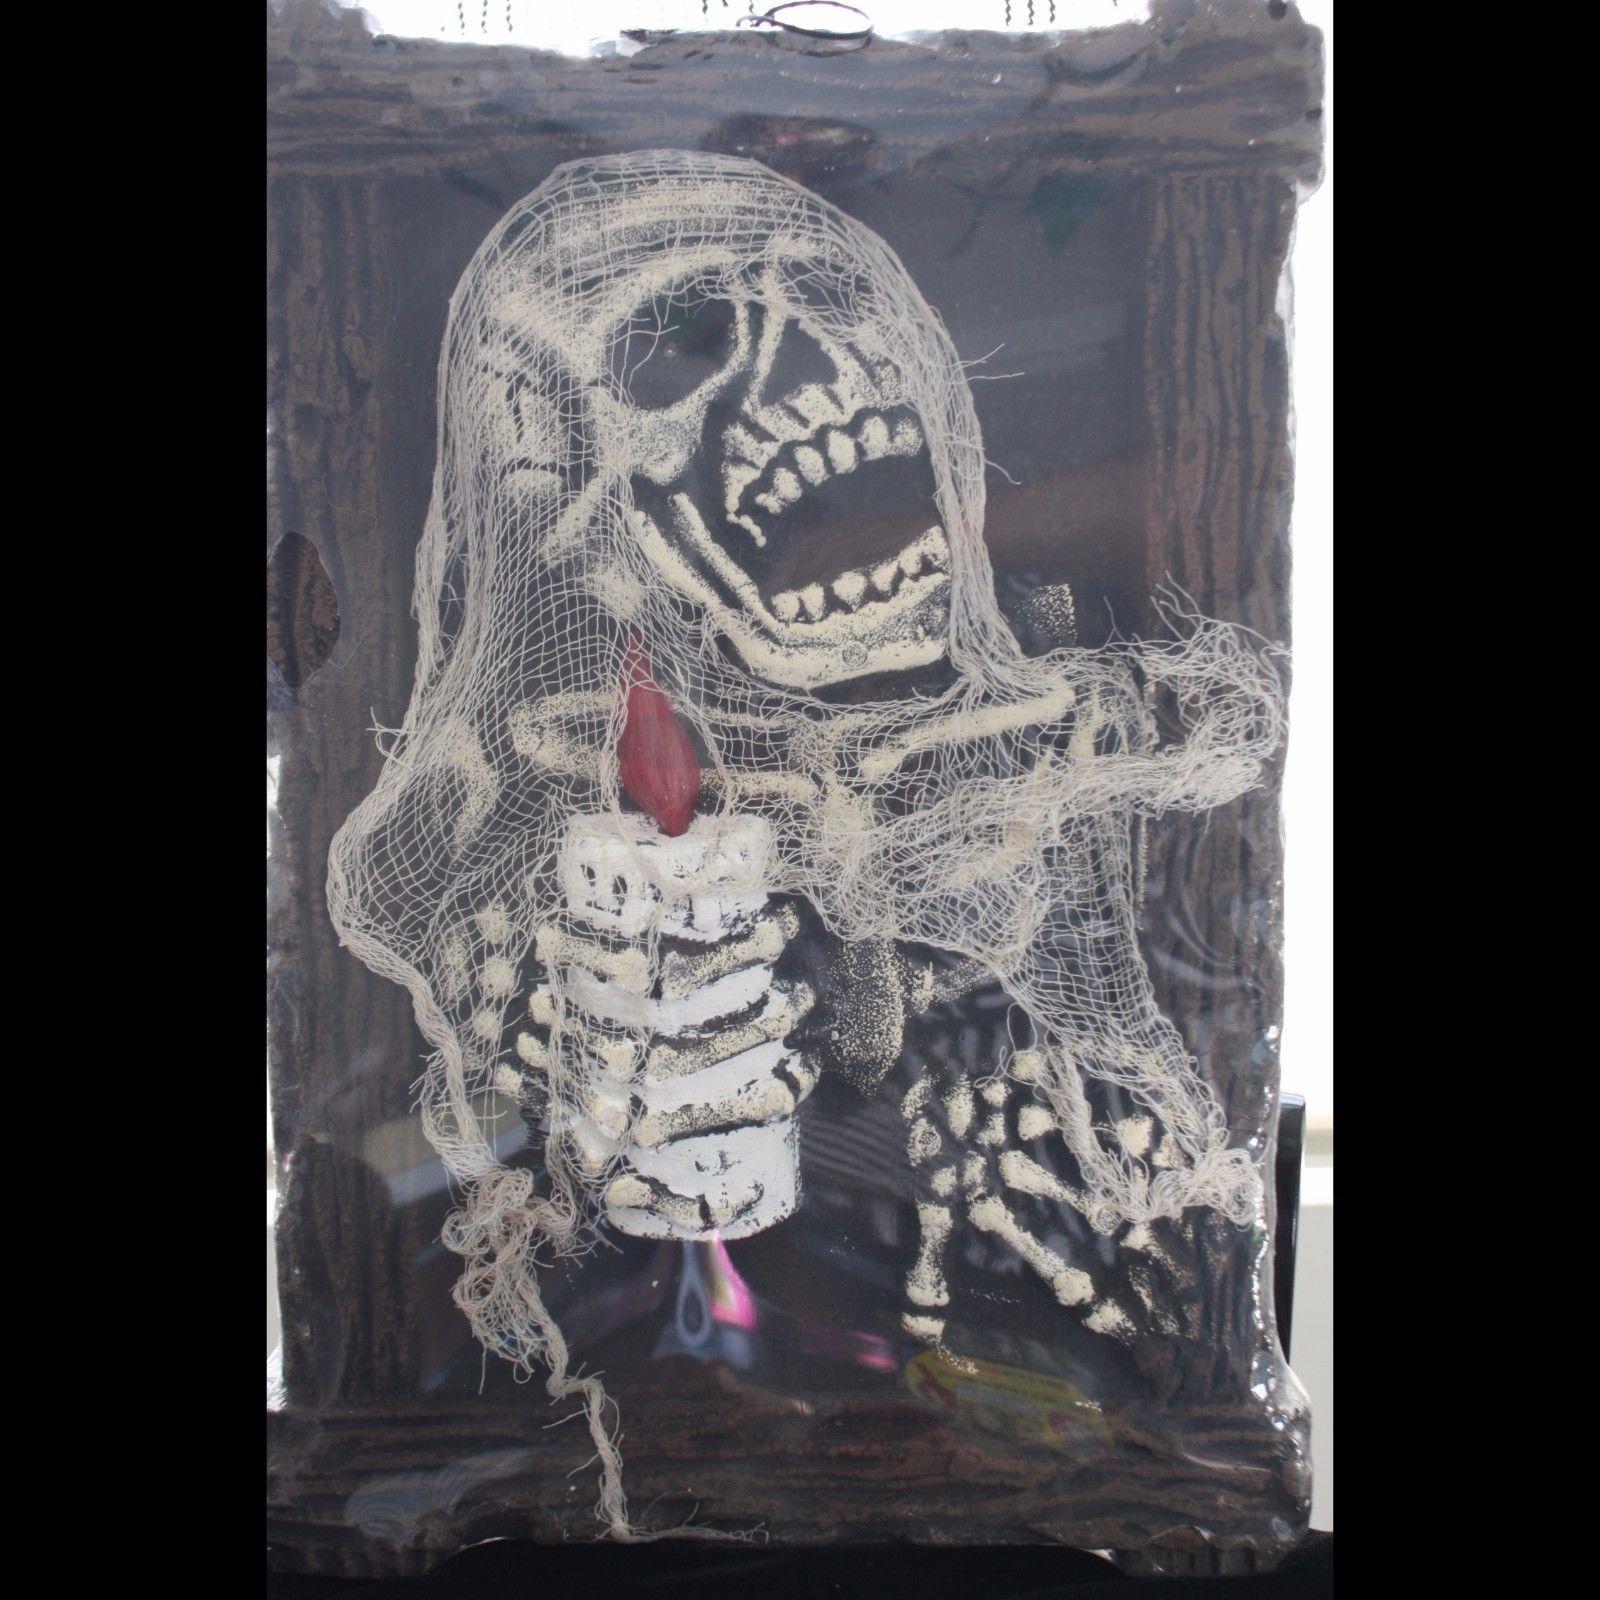 HUGE 3-D Zombie Skeleton LIGHT UP PICTURE PORTRAIT Halloween Prop Decoration-NEW